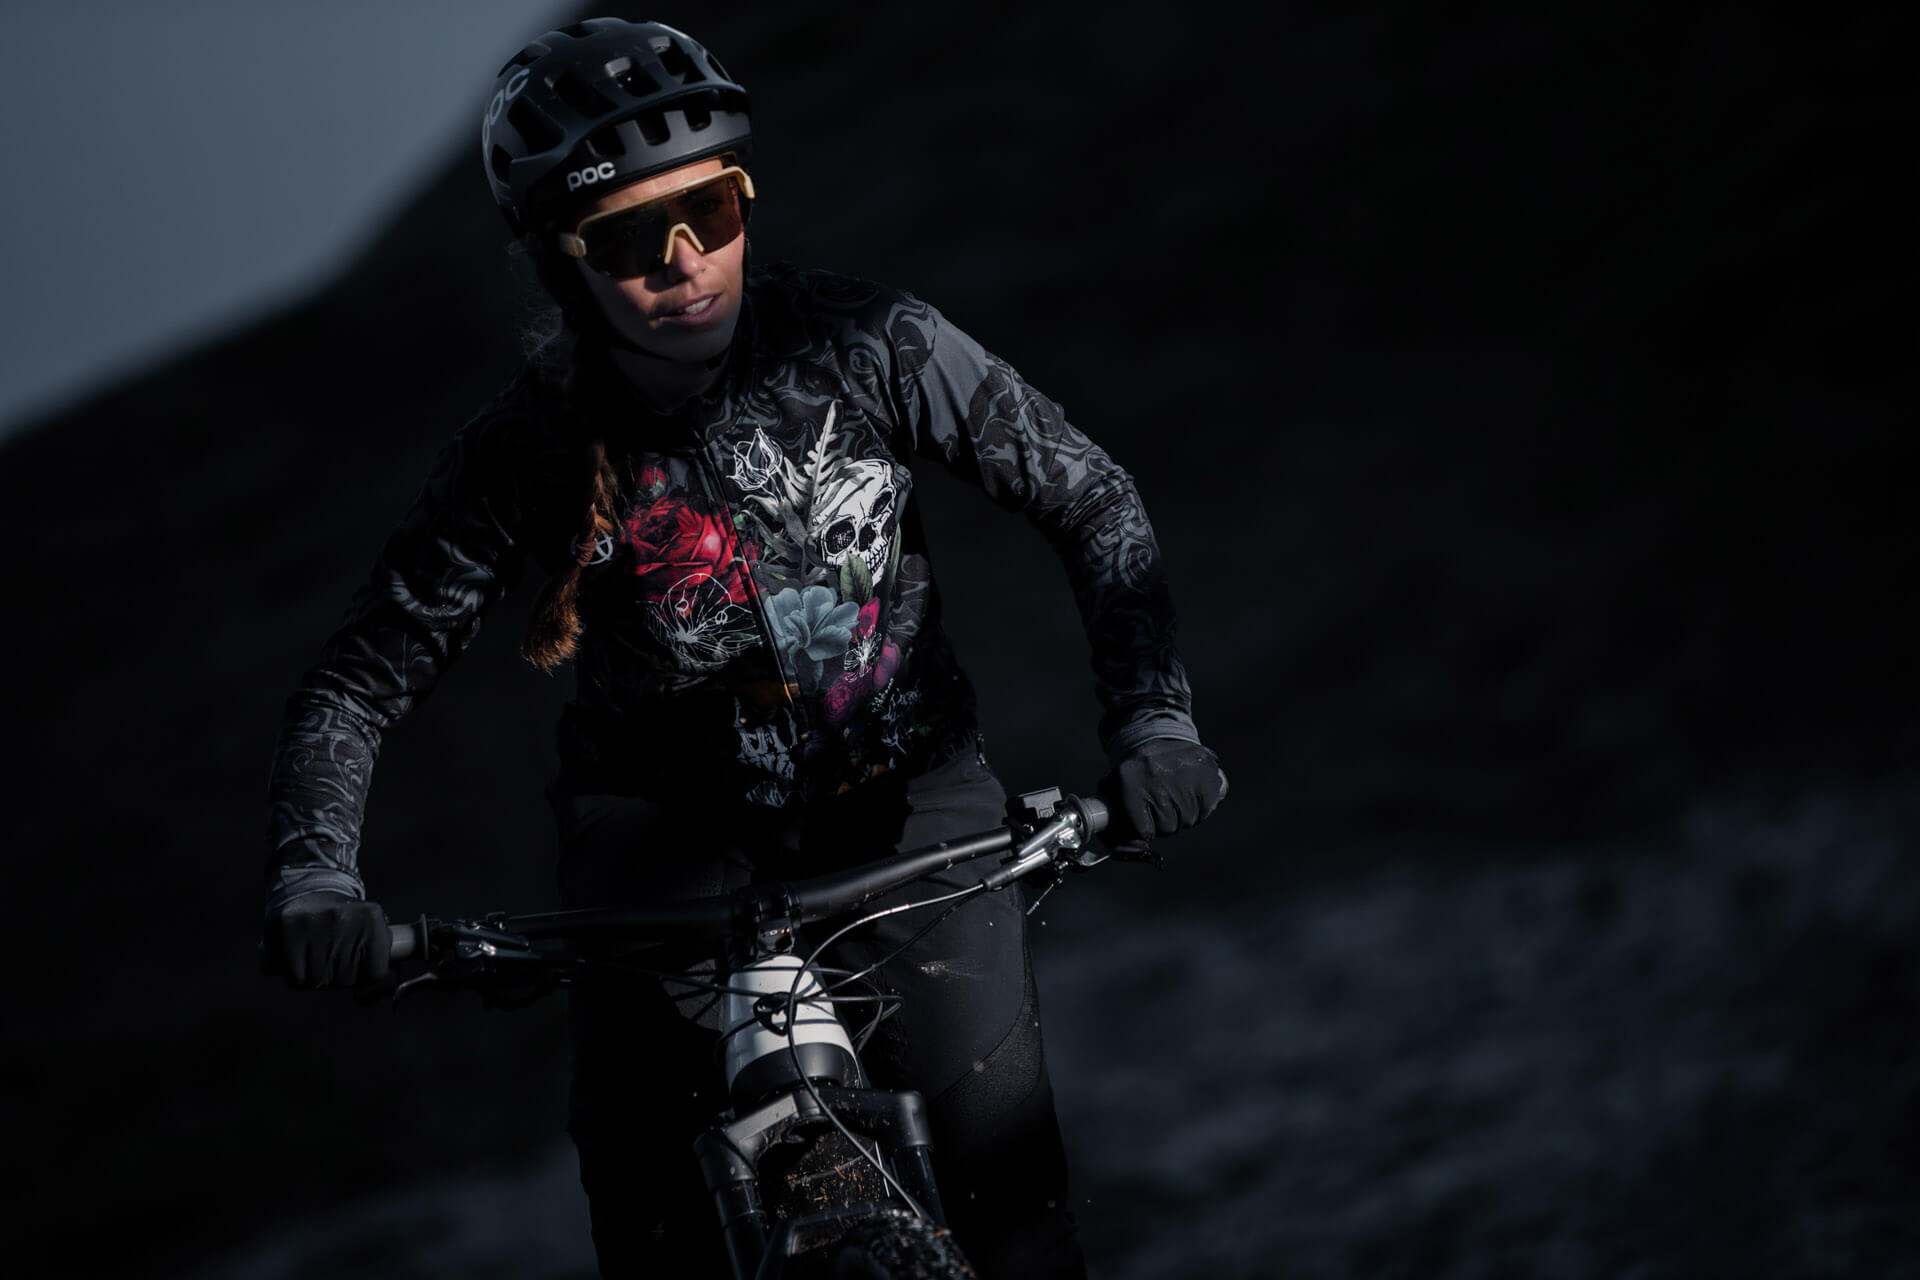 Hansi Heckmair Bike_Protectvesports_Bayern Photographer